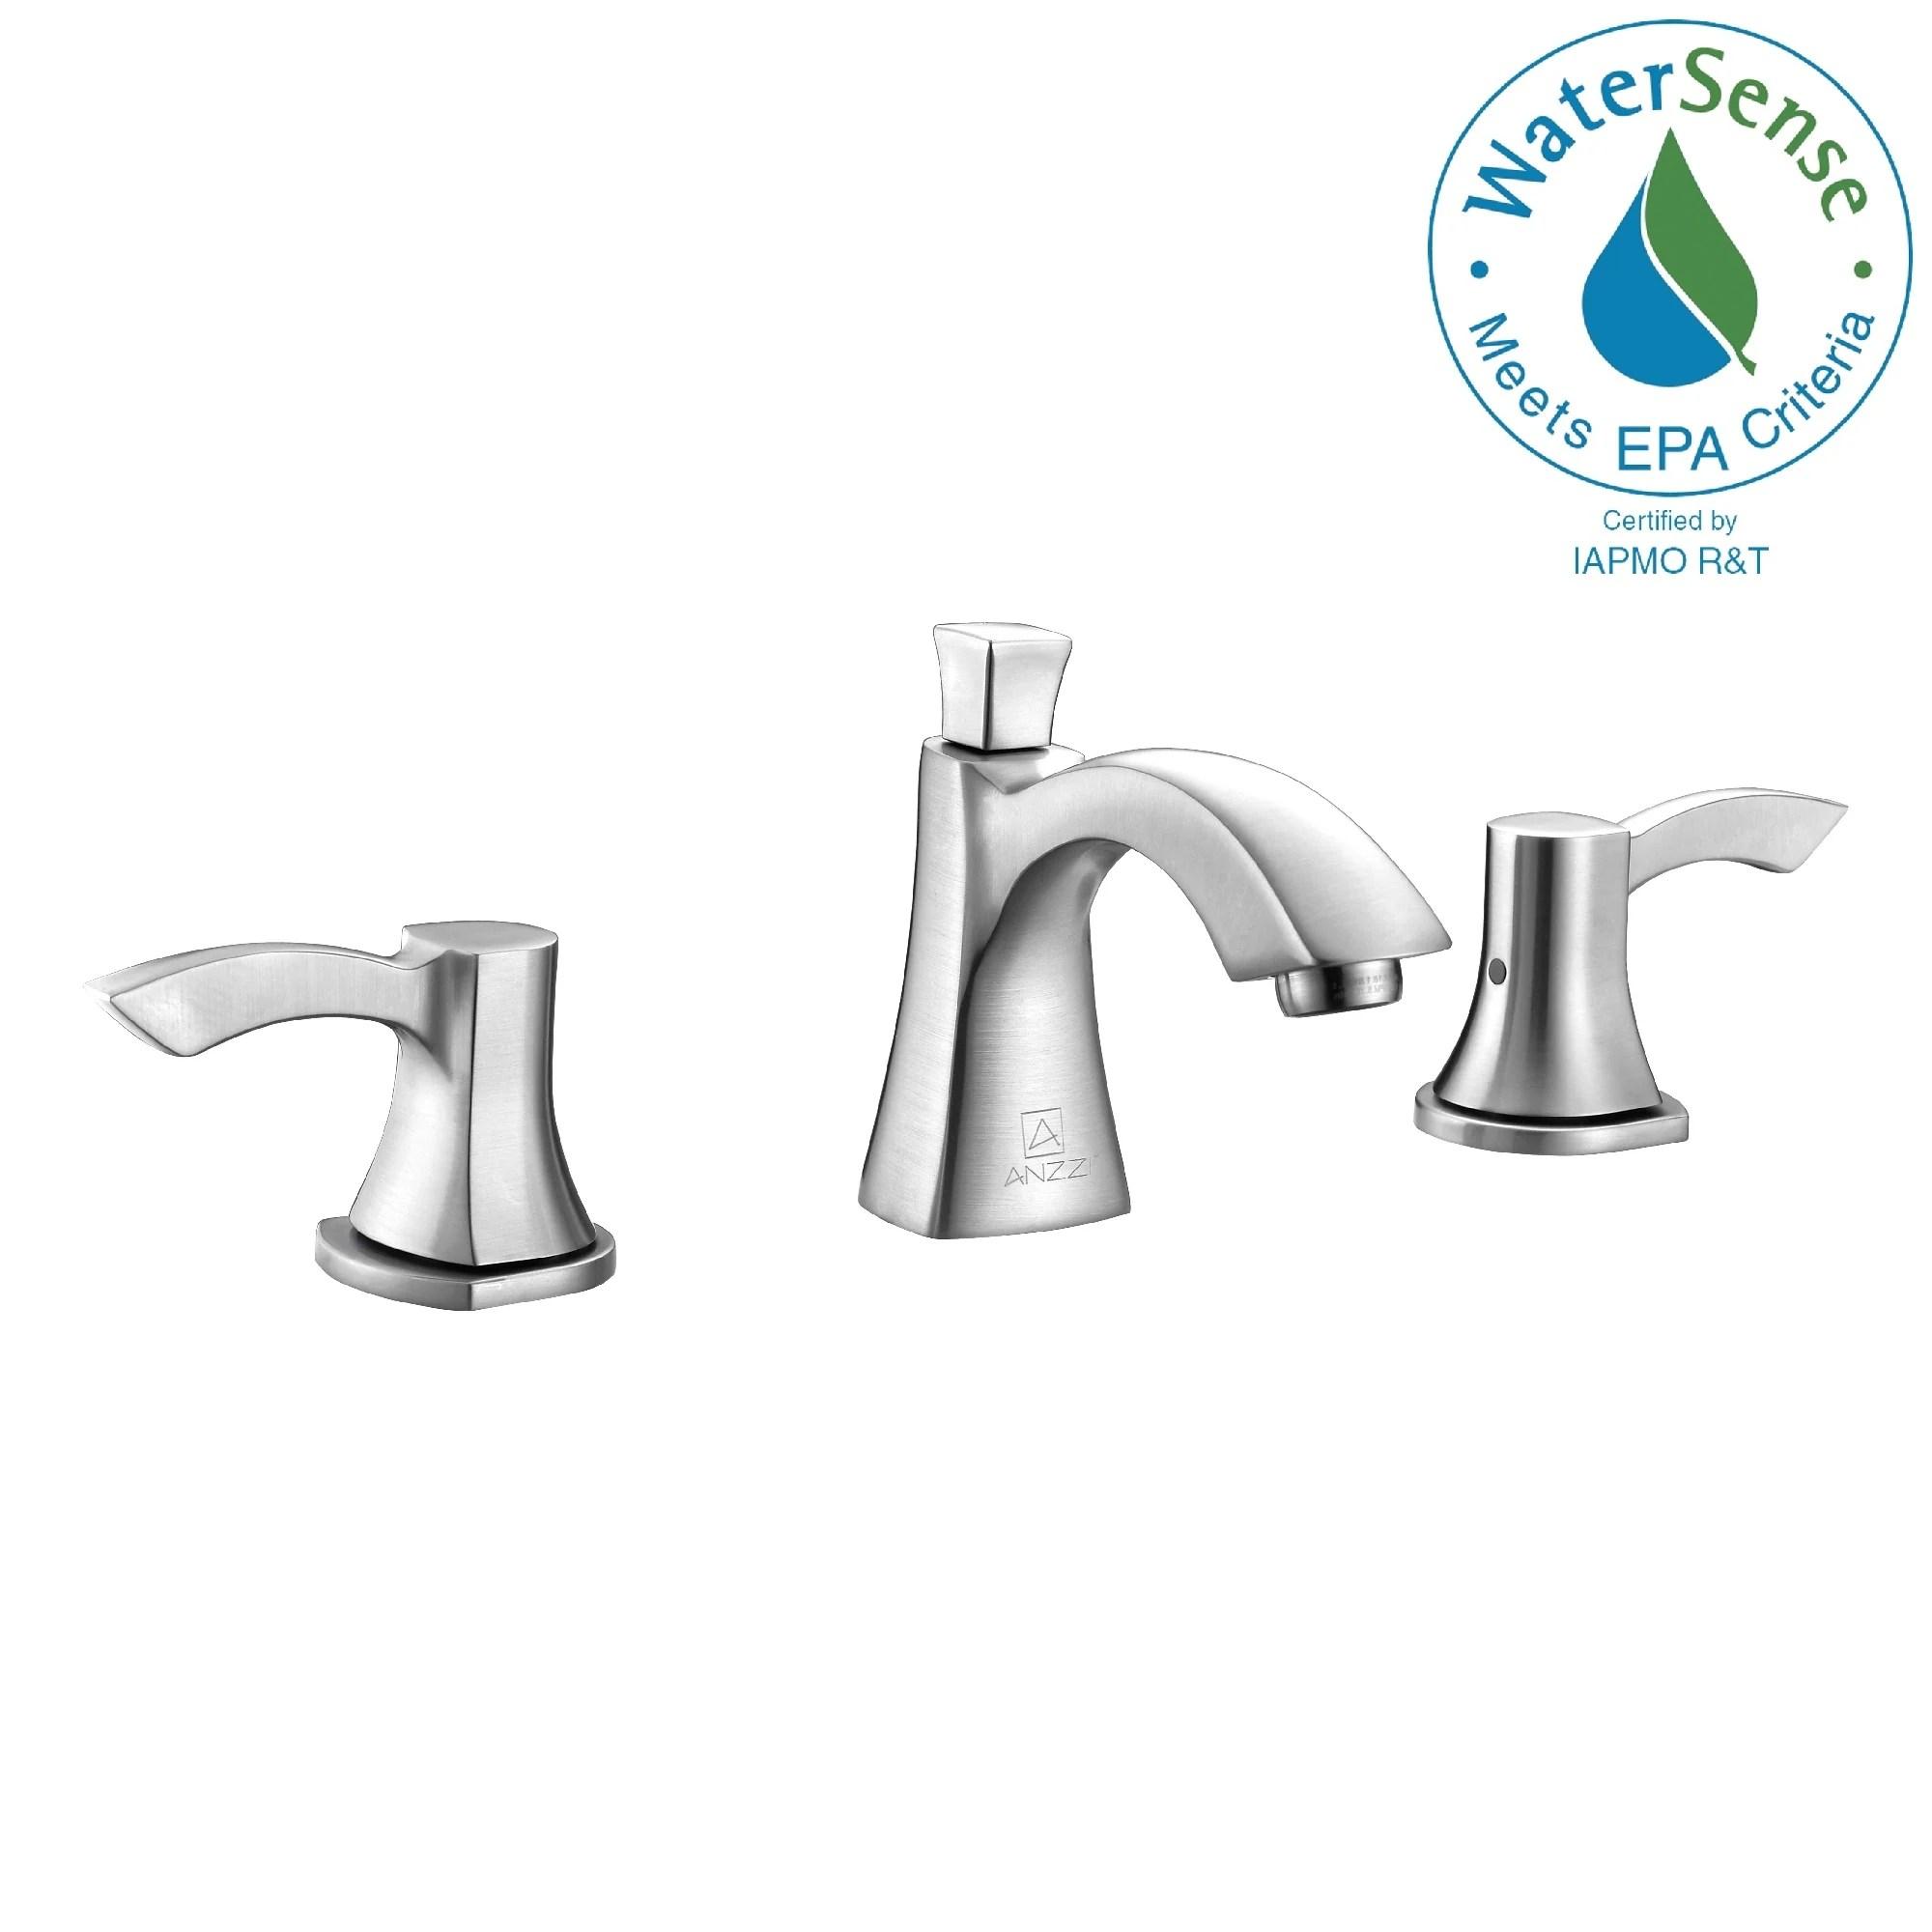 anzzi sonata series 8 inch widespread 2 handle mid arc bathroom faucet in brushed nickel